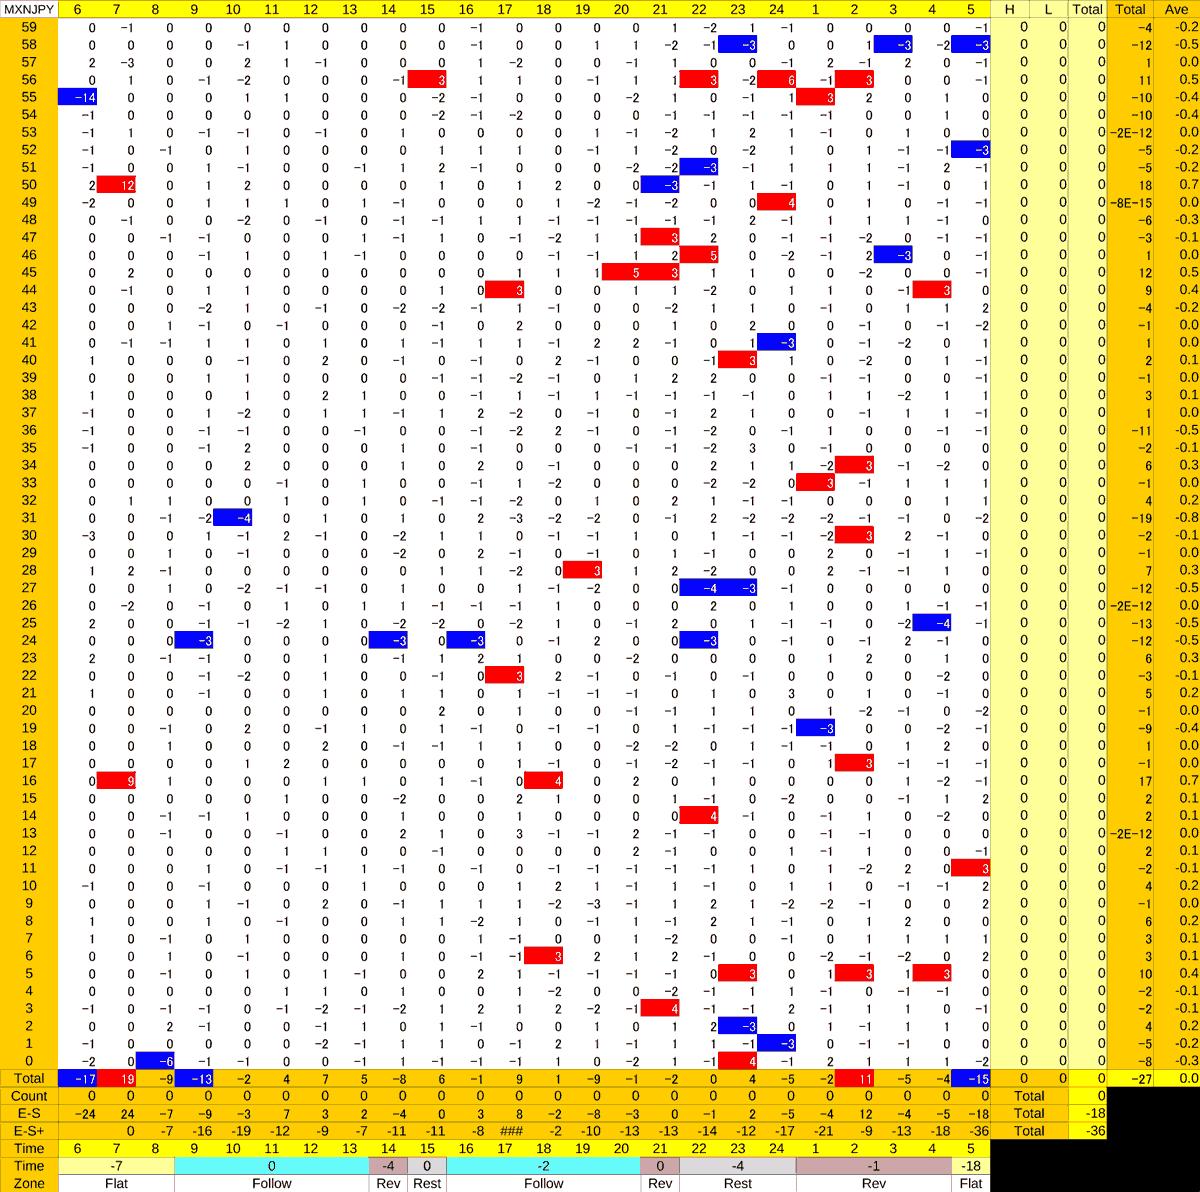 20201118_HS(3)MXNJPY